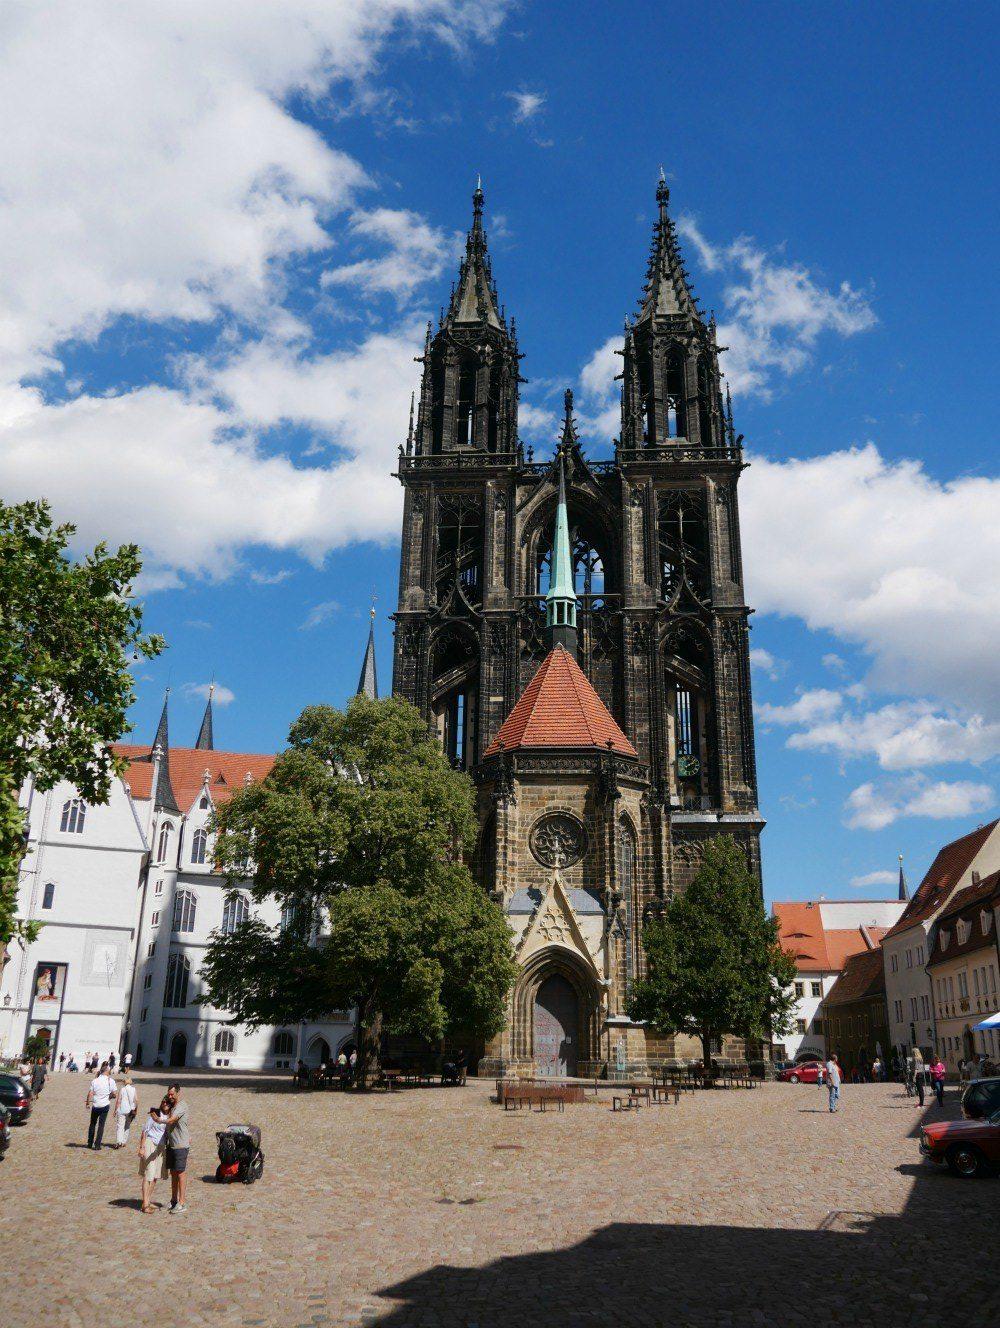 Cathedral in Meissen in Saxony, Germany Photo Heatheronhertravels.com